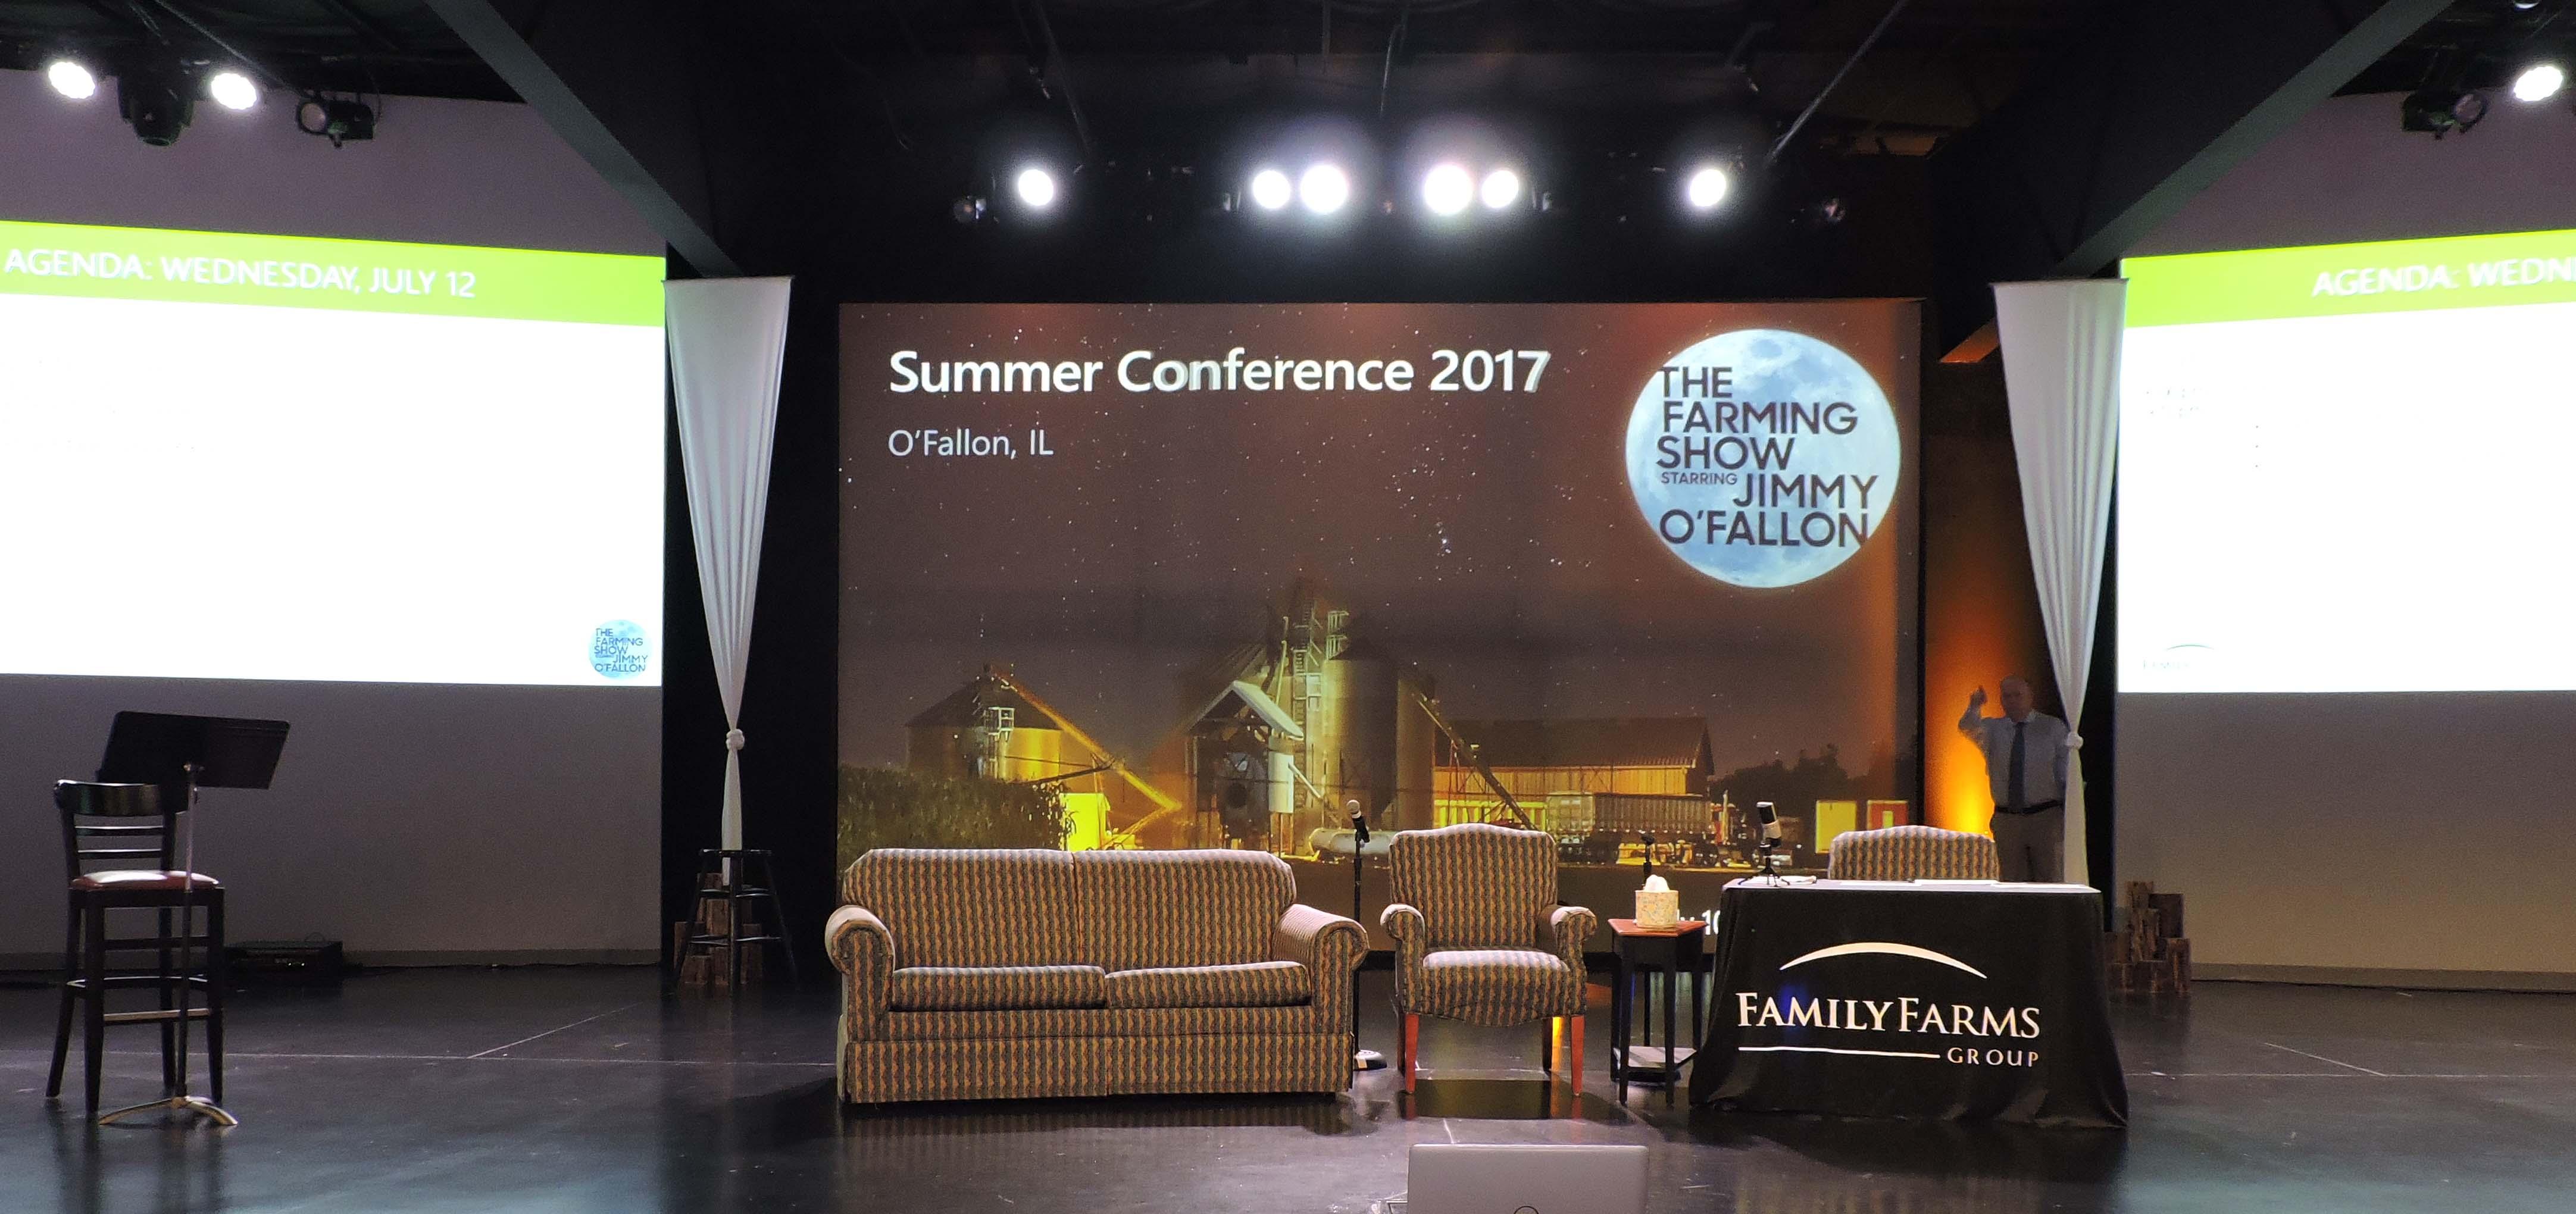 2017 FamilyFarms Group Summer Conference a Huge Success!